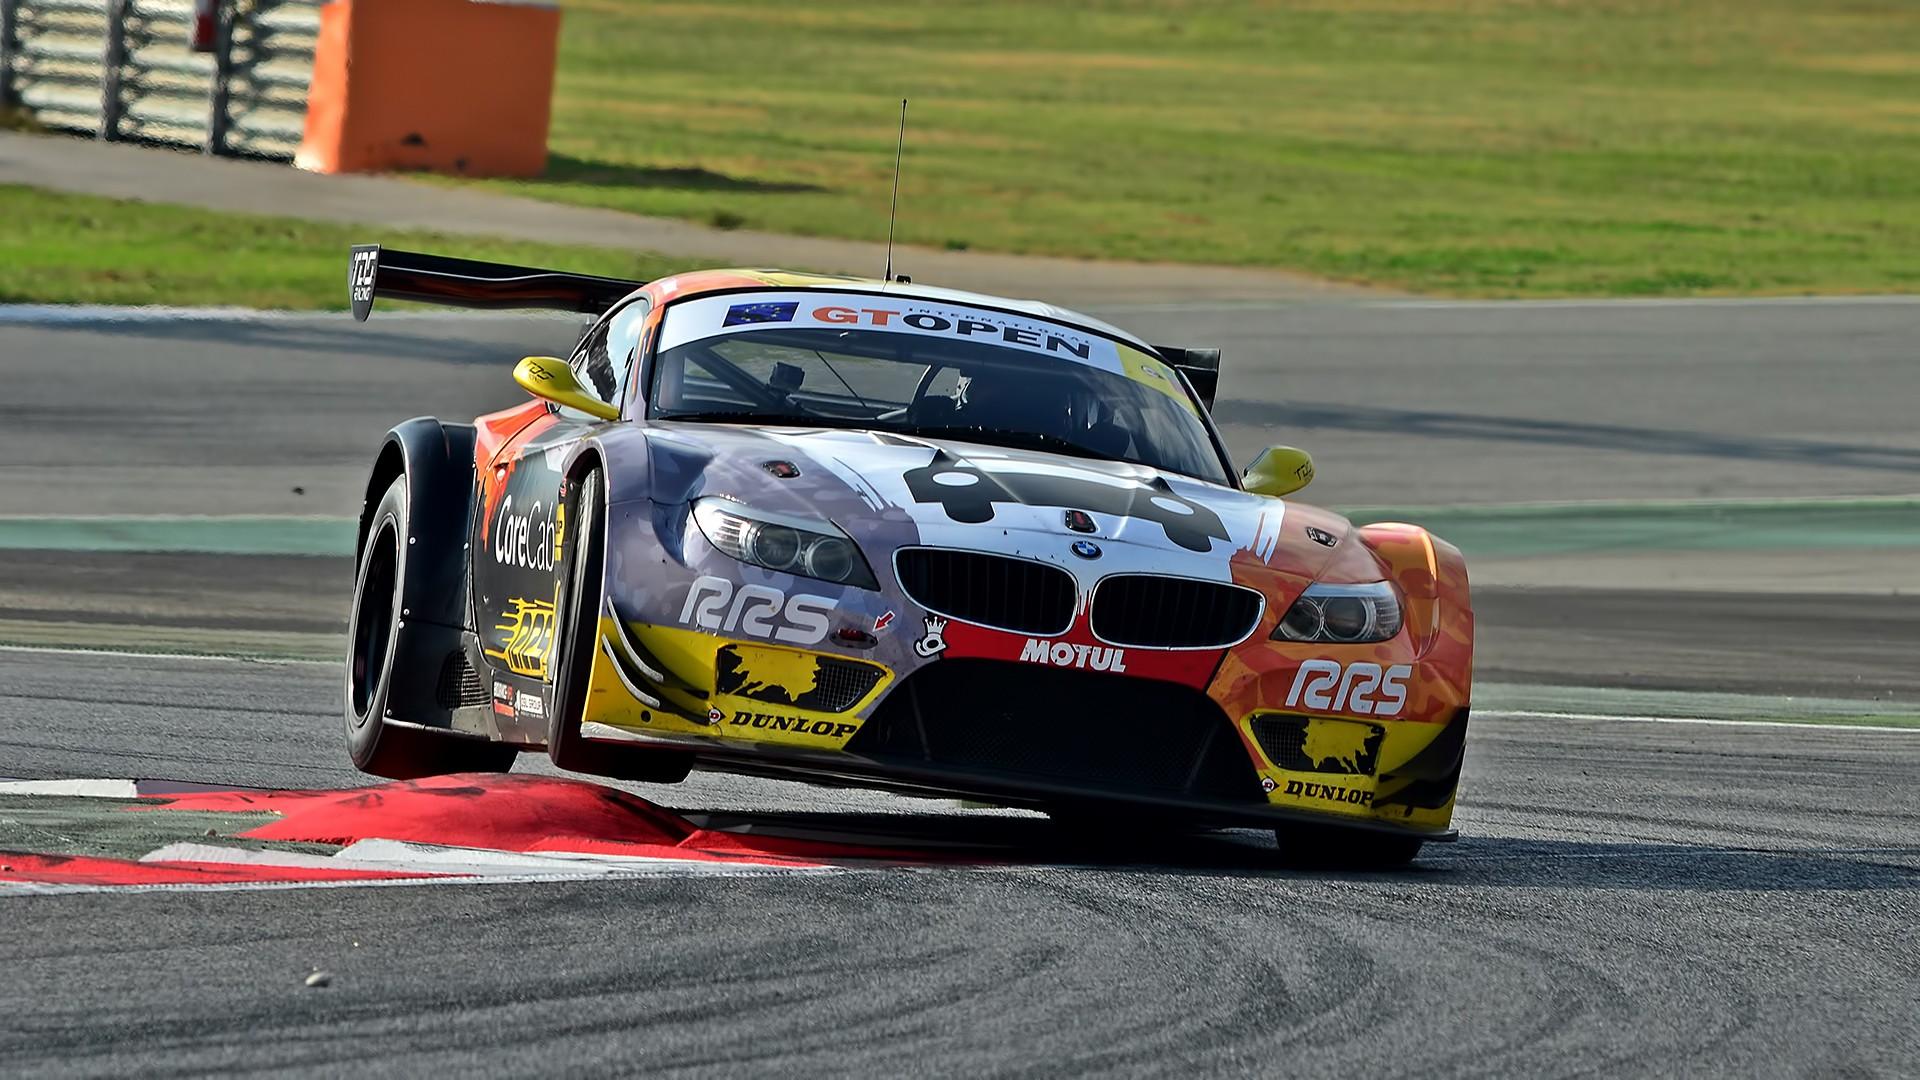 Wallpaper Race Cars Sports Car Bmw Z4 Gt3 Performance Car